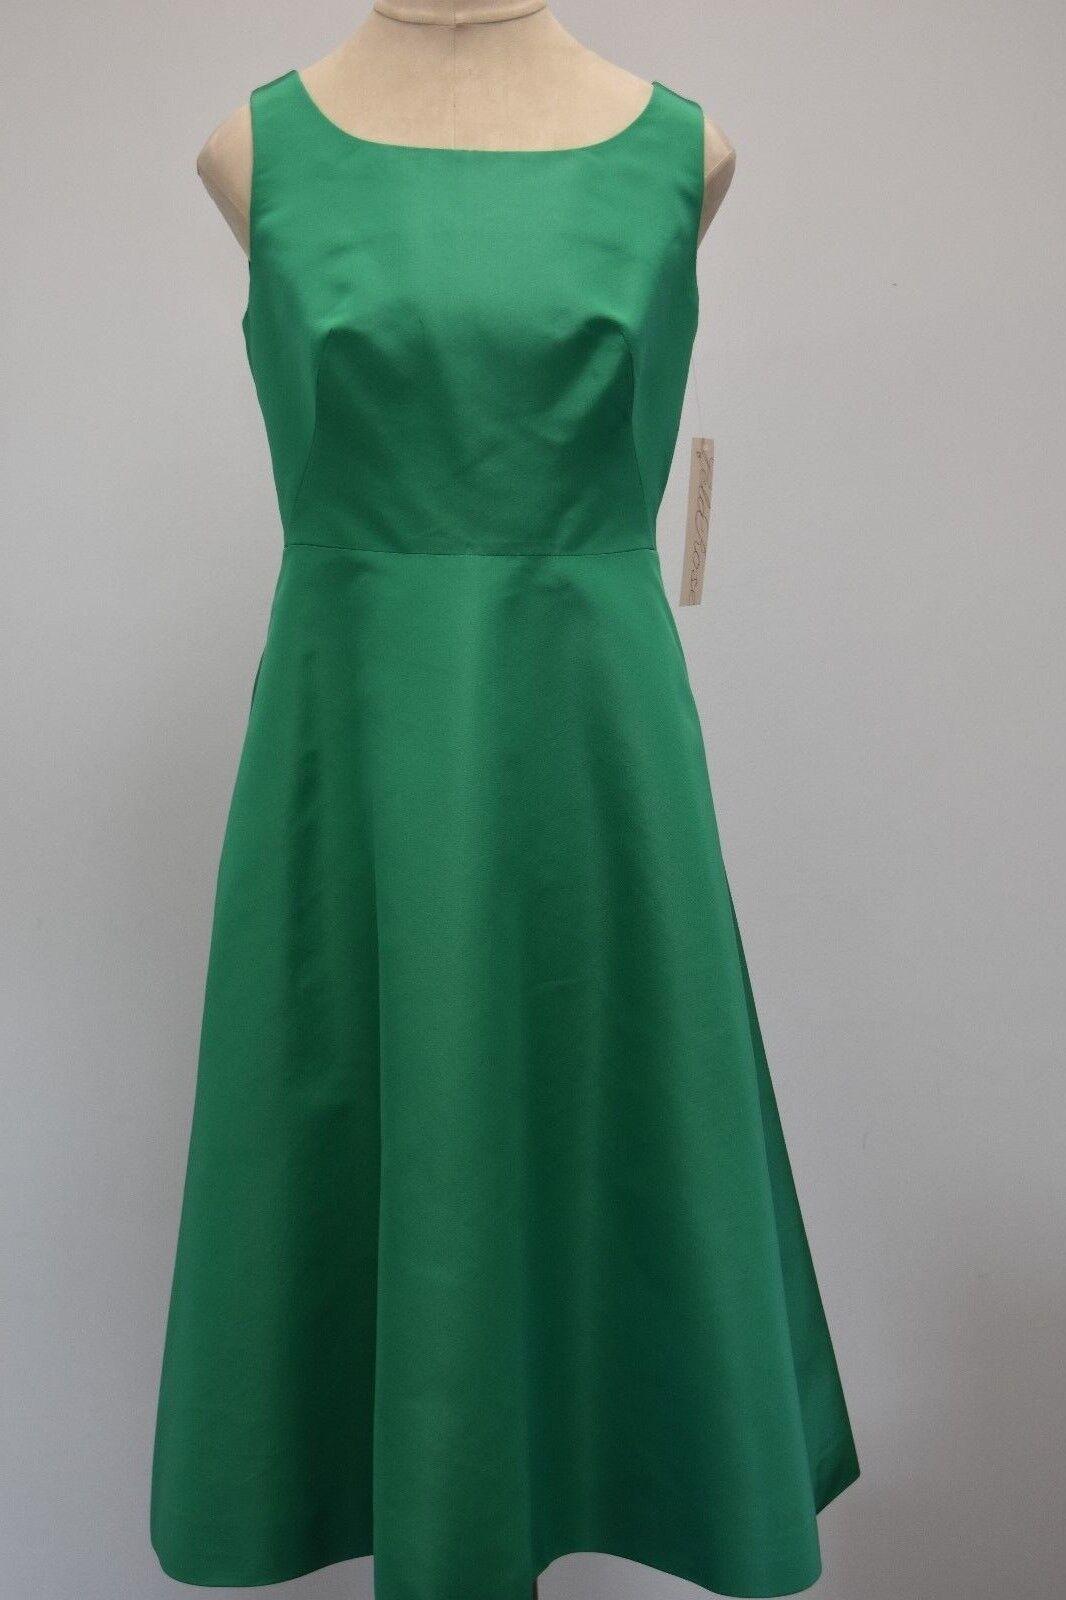 New 18 Lela rosa Seta Faille Fit And Flare Gonna a Pieghe Abito verde Smeraldo 4